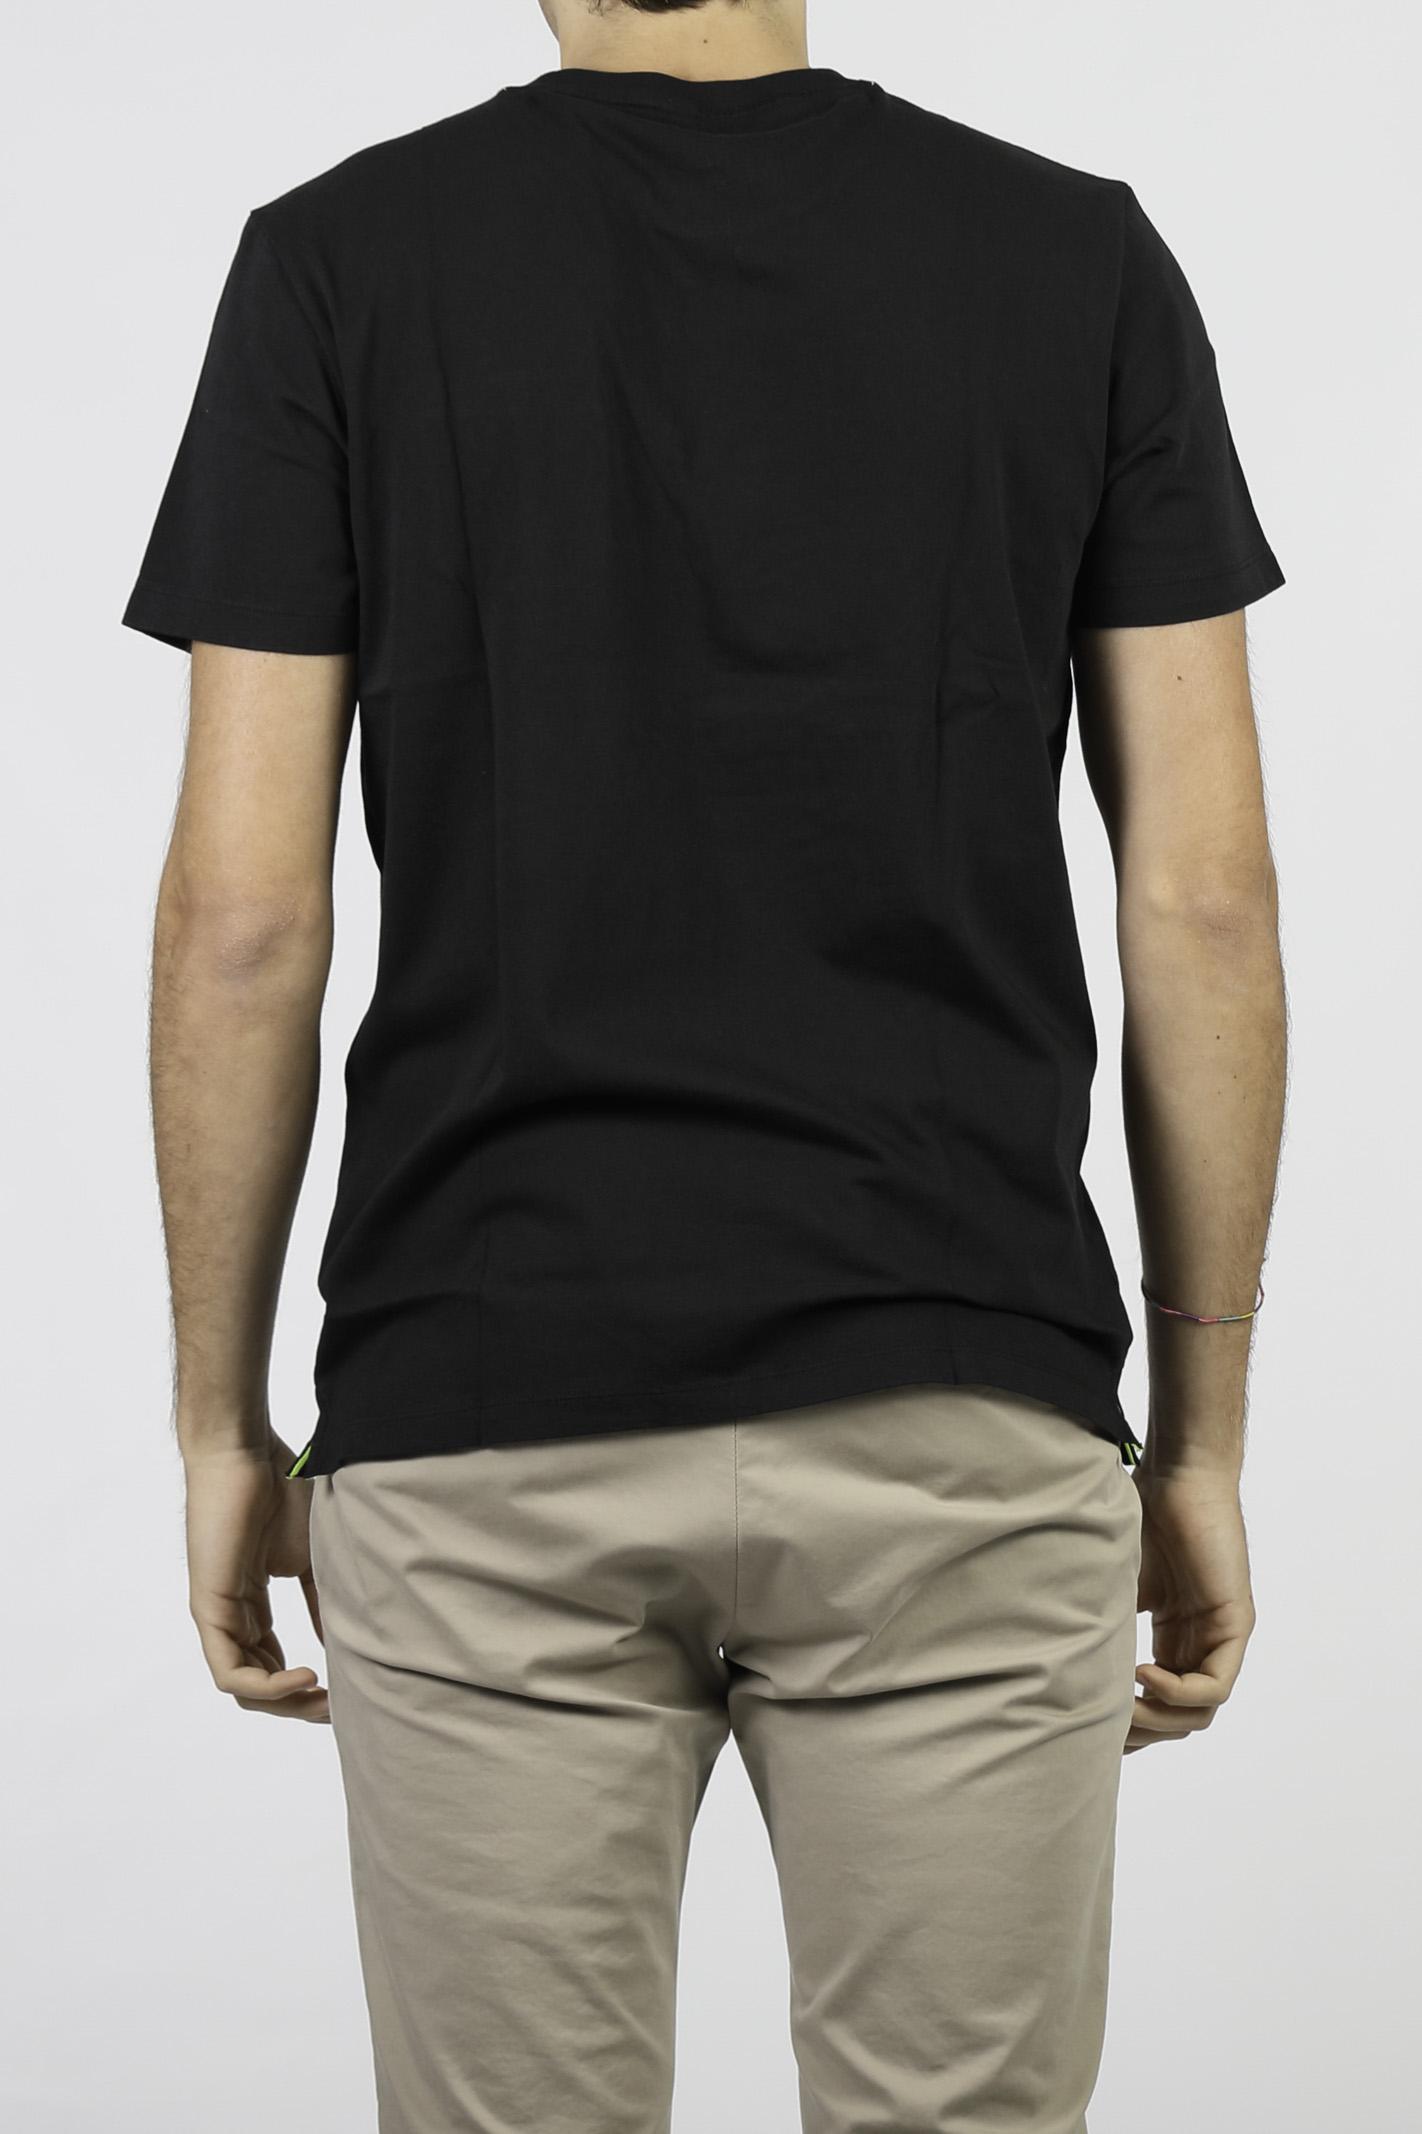 T-SHIRT IN COTONE SUN 68   T-shirt   T3110611